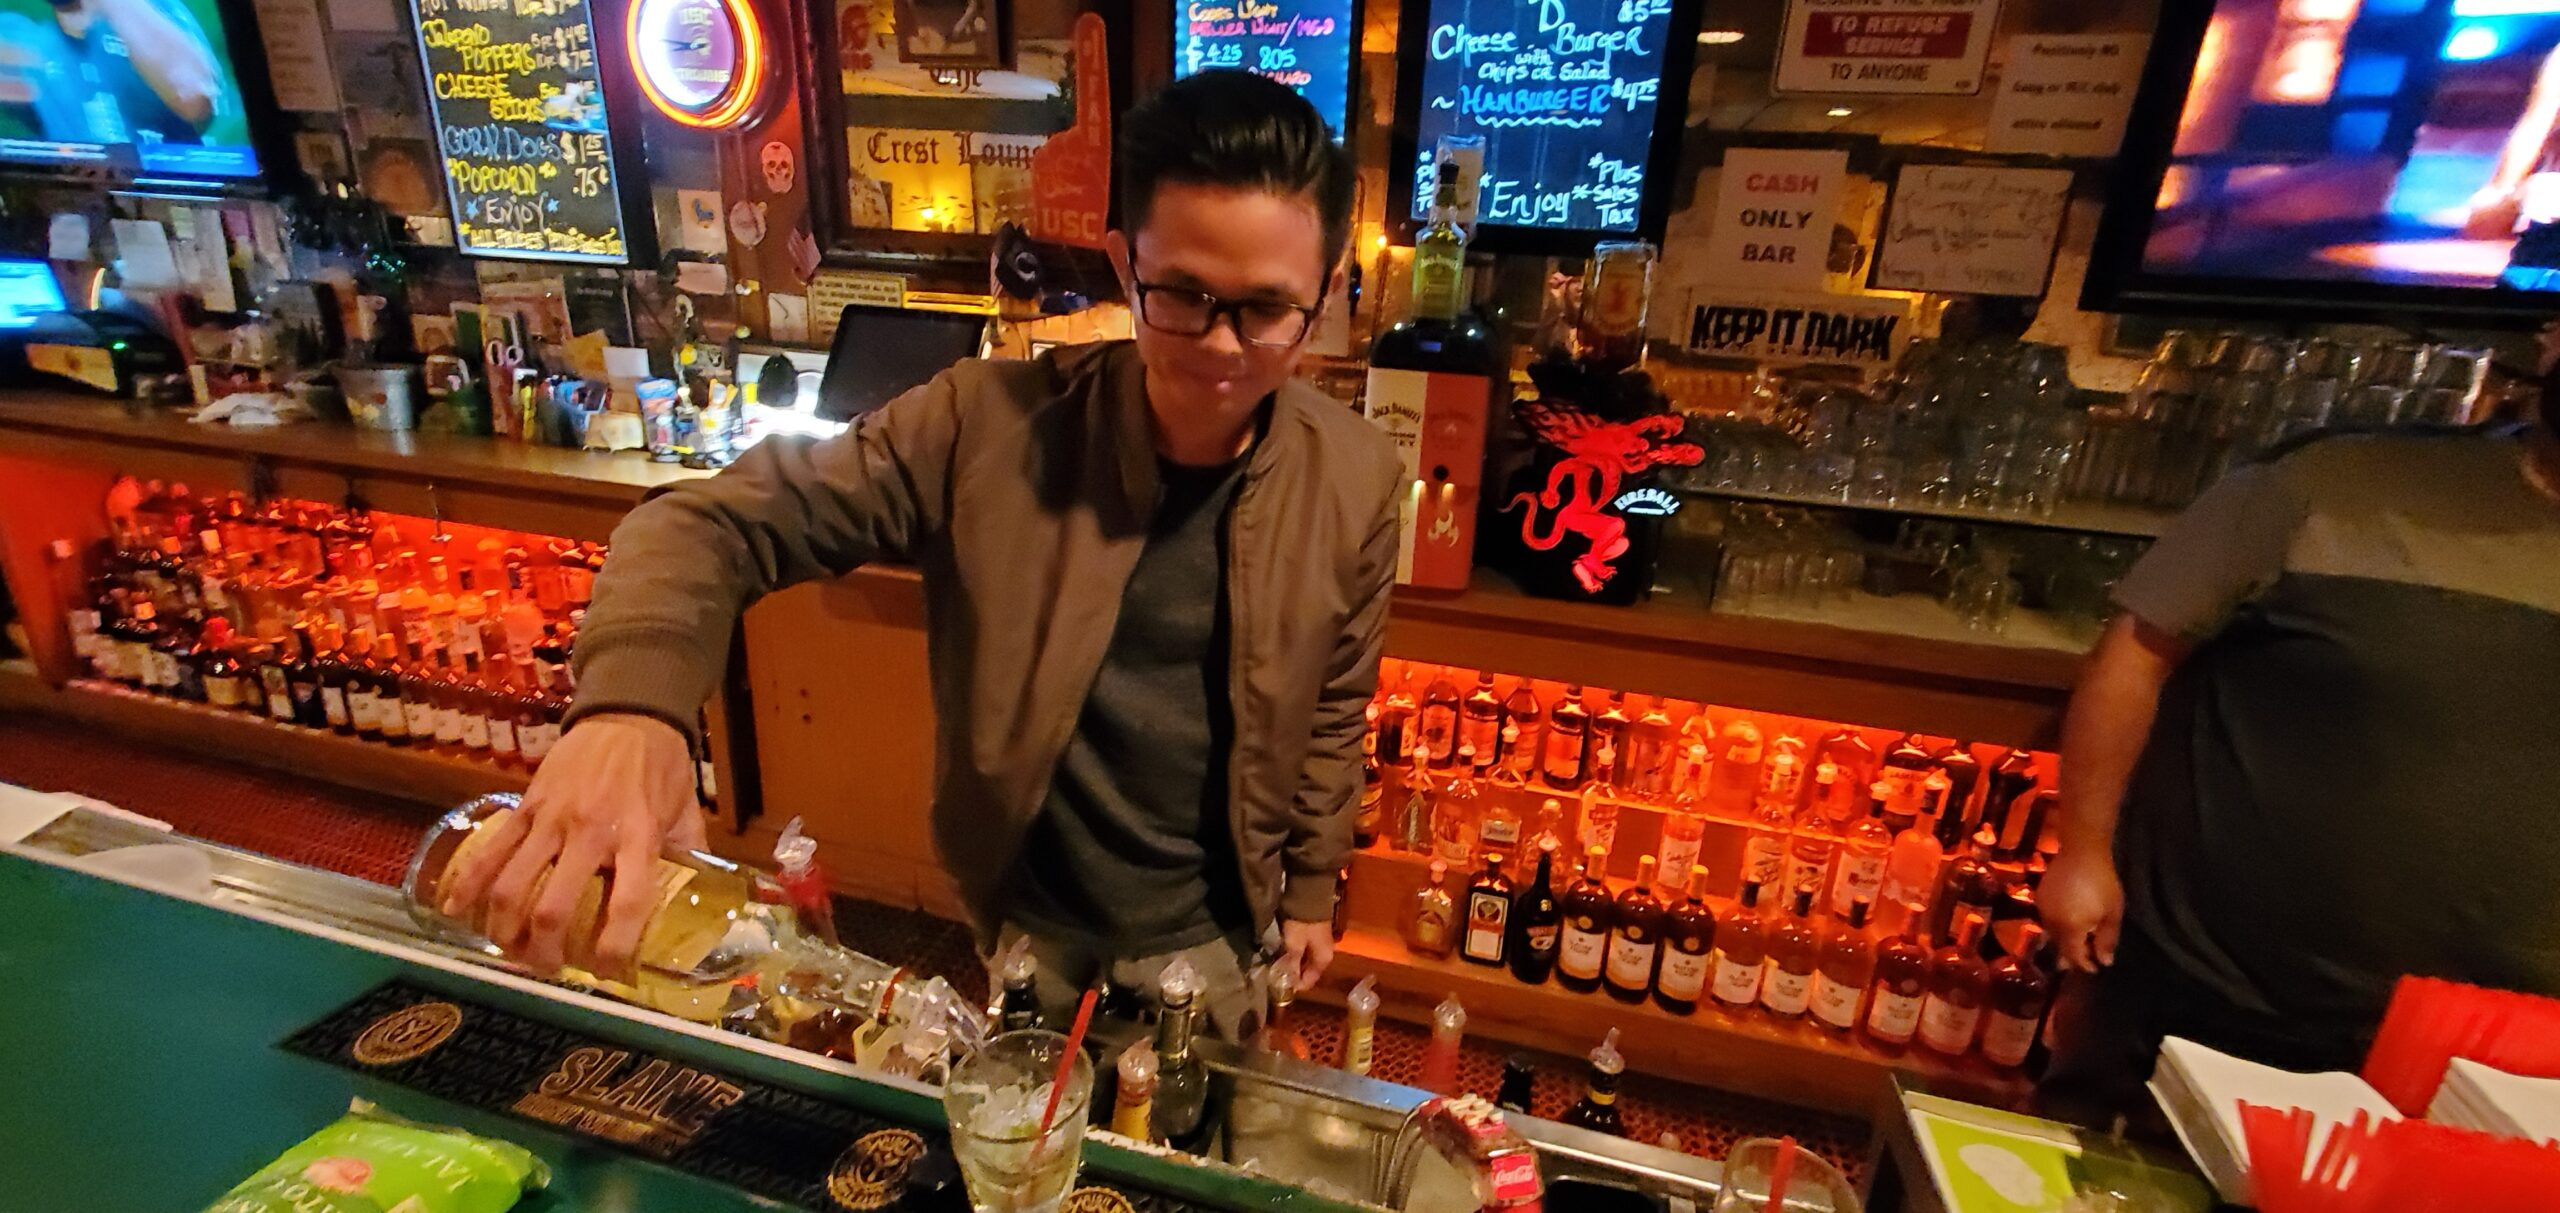 hao behind the bar